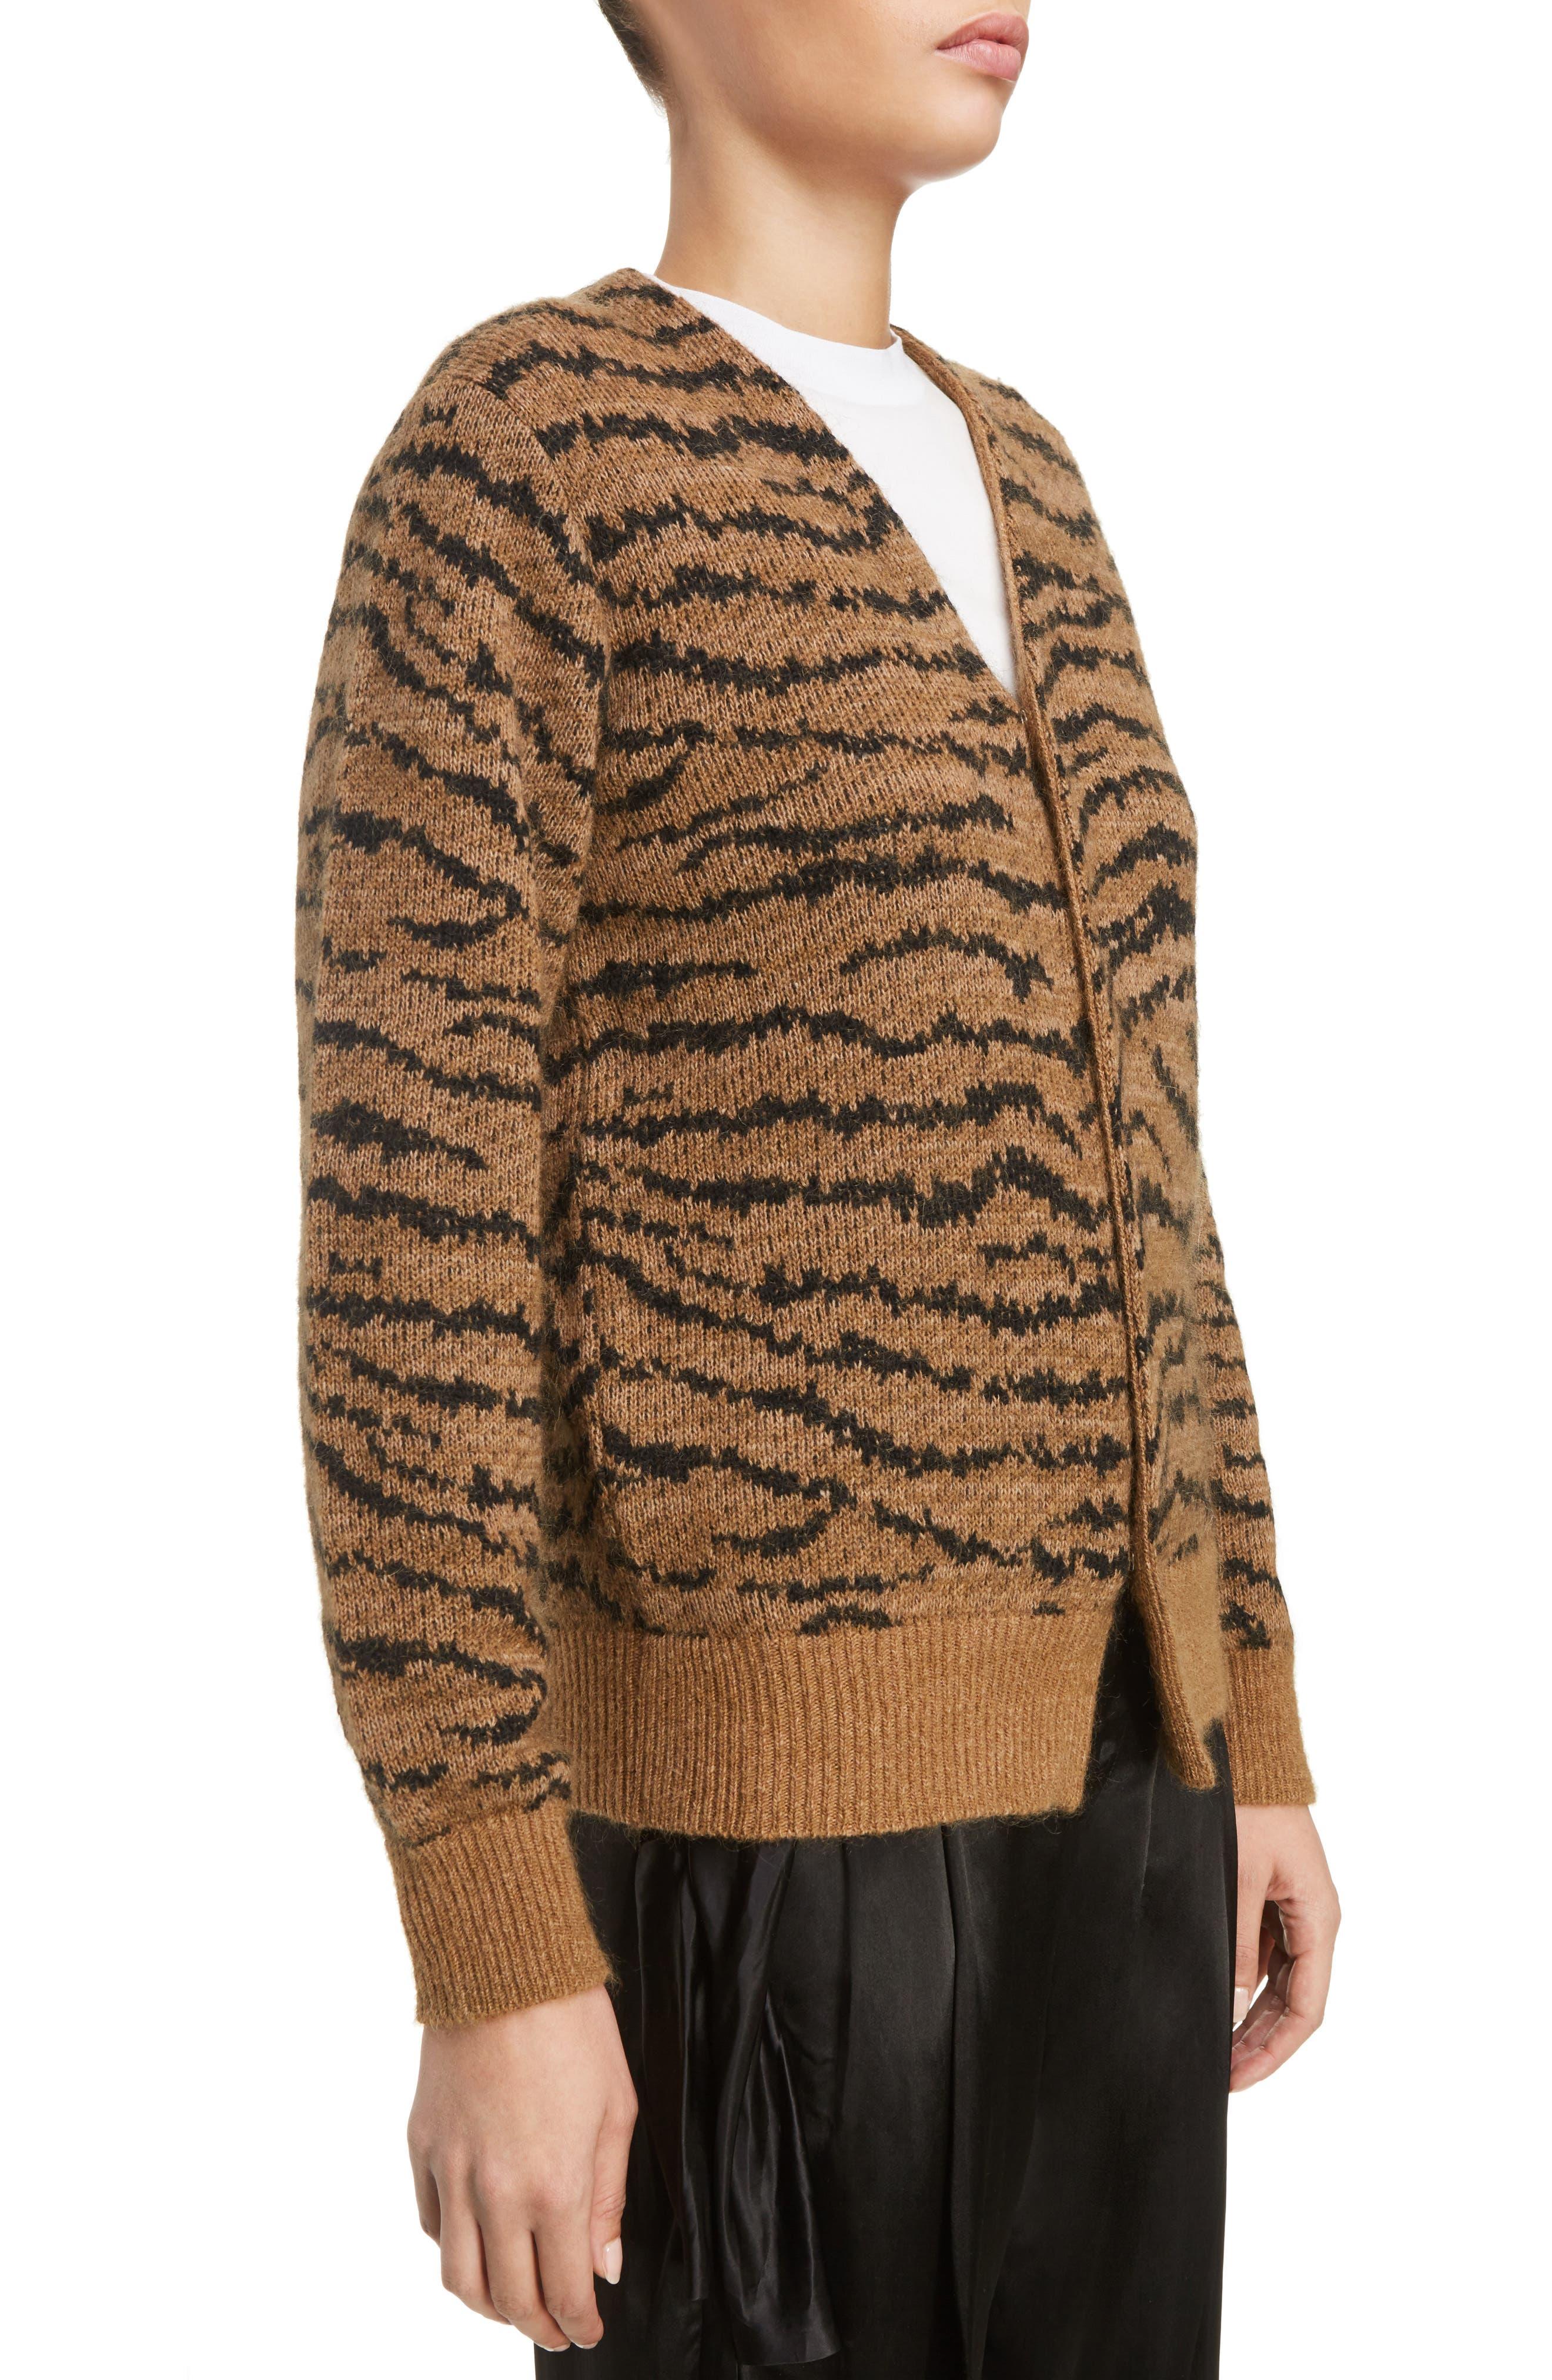 Tiger Jacquard Knit Button Cardigan,                             Alternate thumbnail 5, color,                             Beige